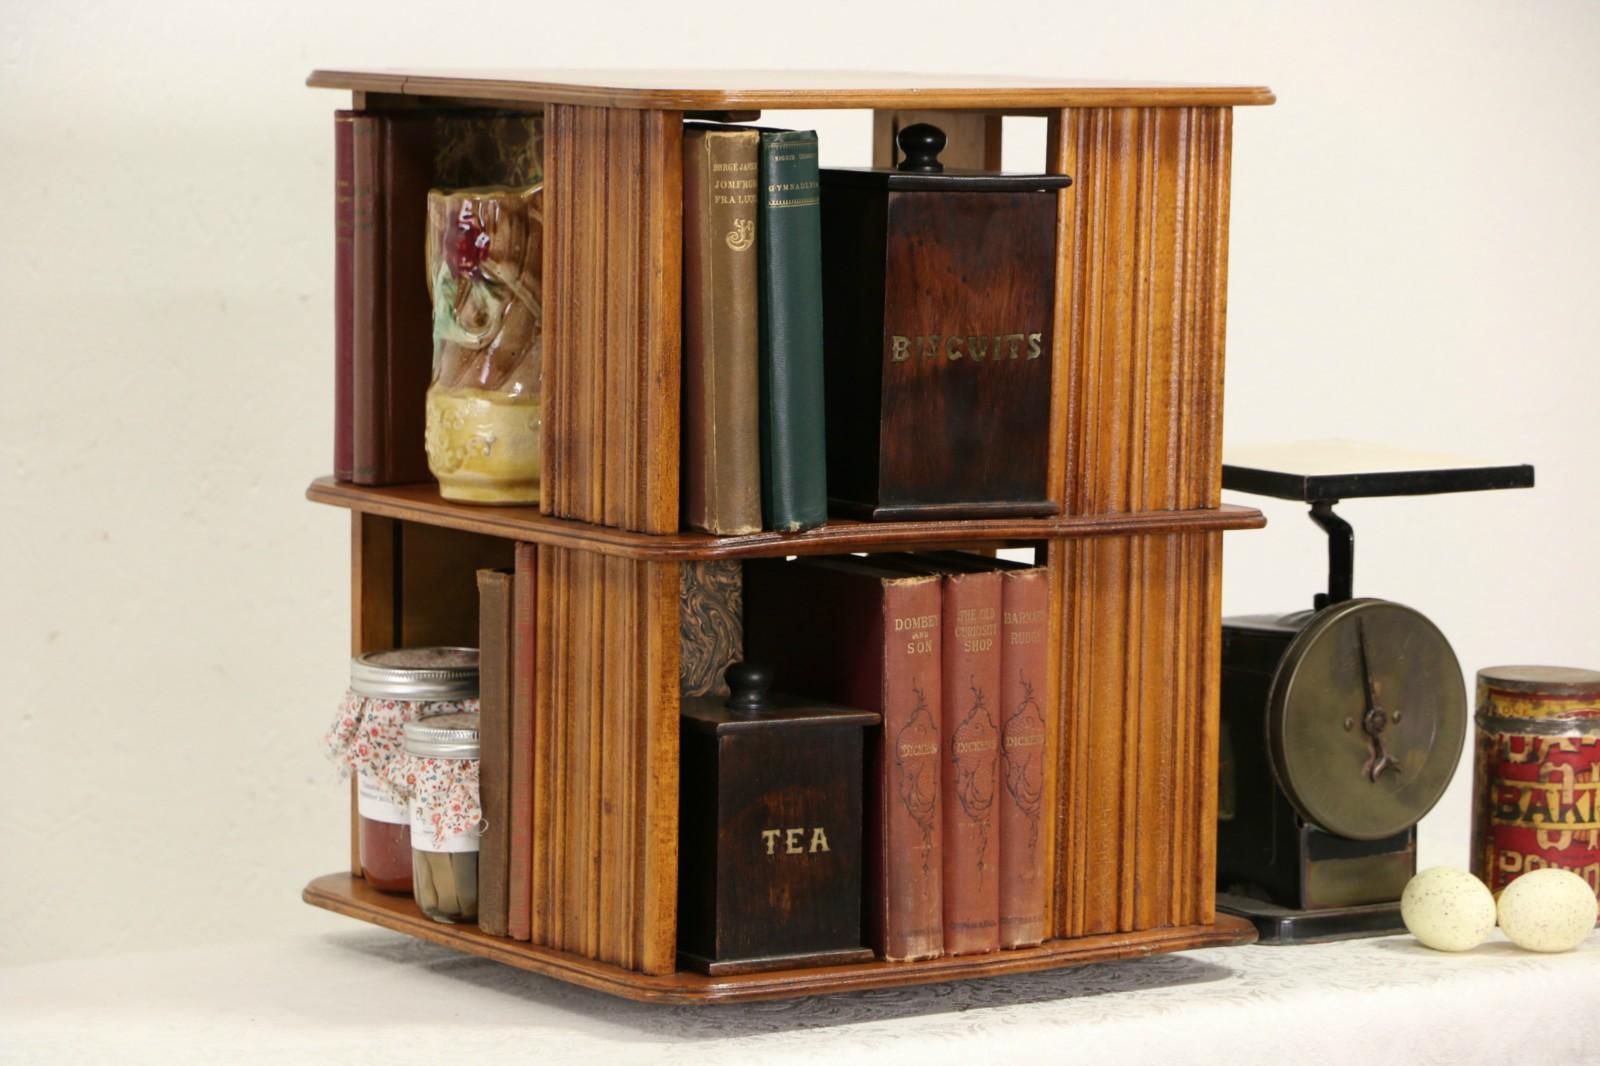 Spinning Bookcase, 1890's Antique Chairside or Tabletop Revolving Bookshelf  ...